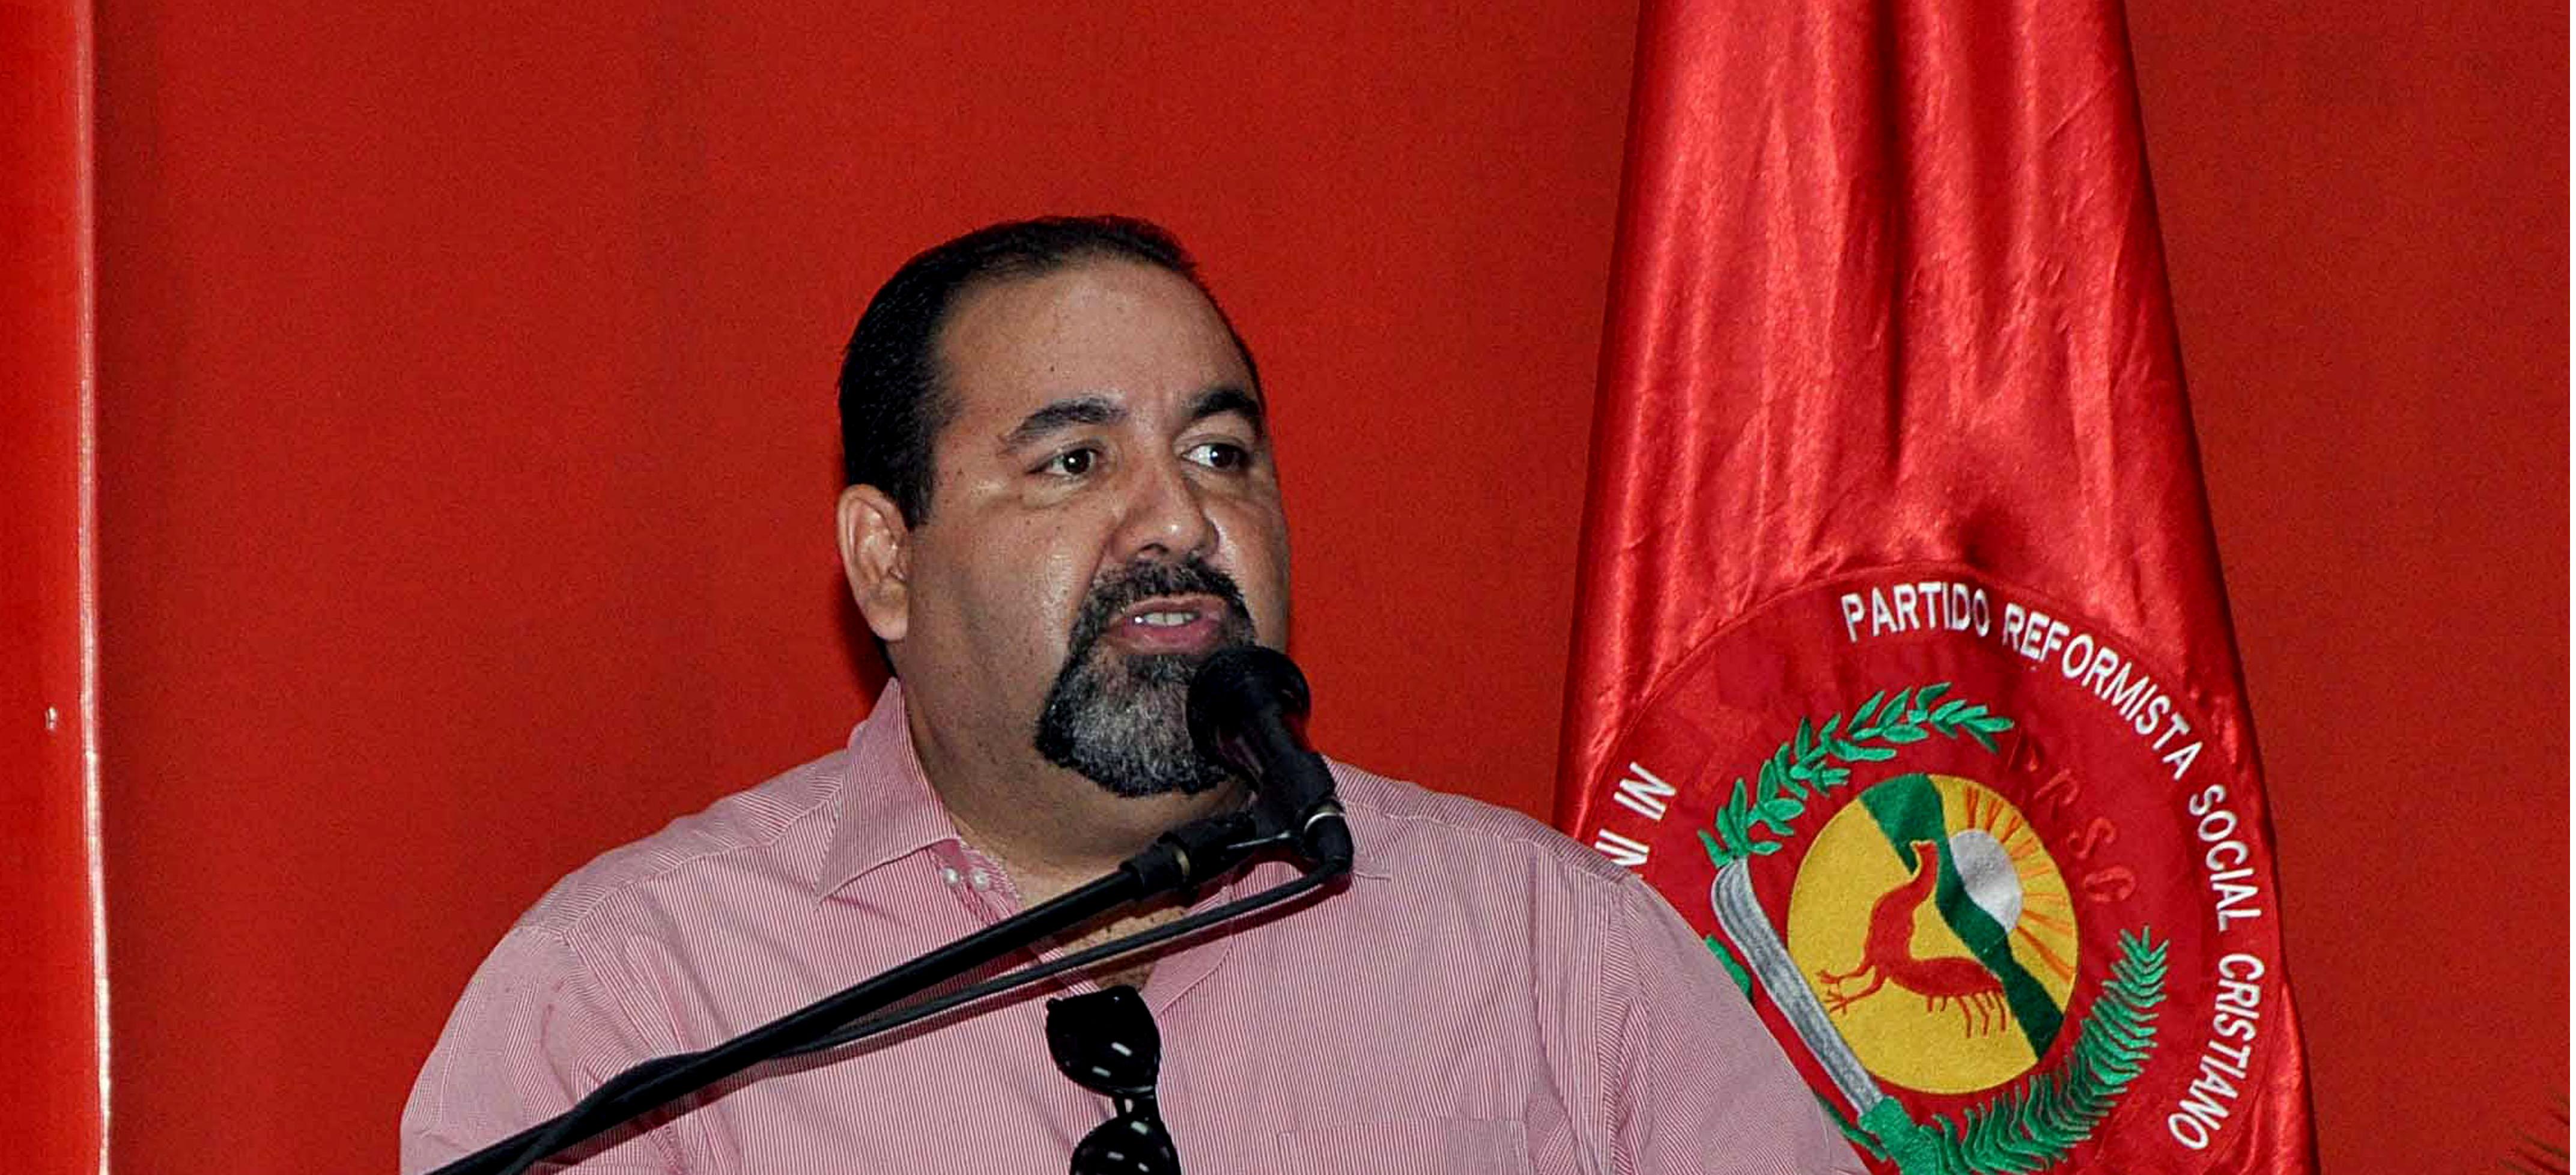 PRSC propone destinar 184 millones de dólares de Odebrecht a municipalidad